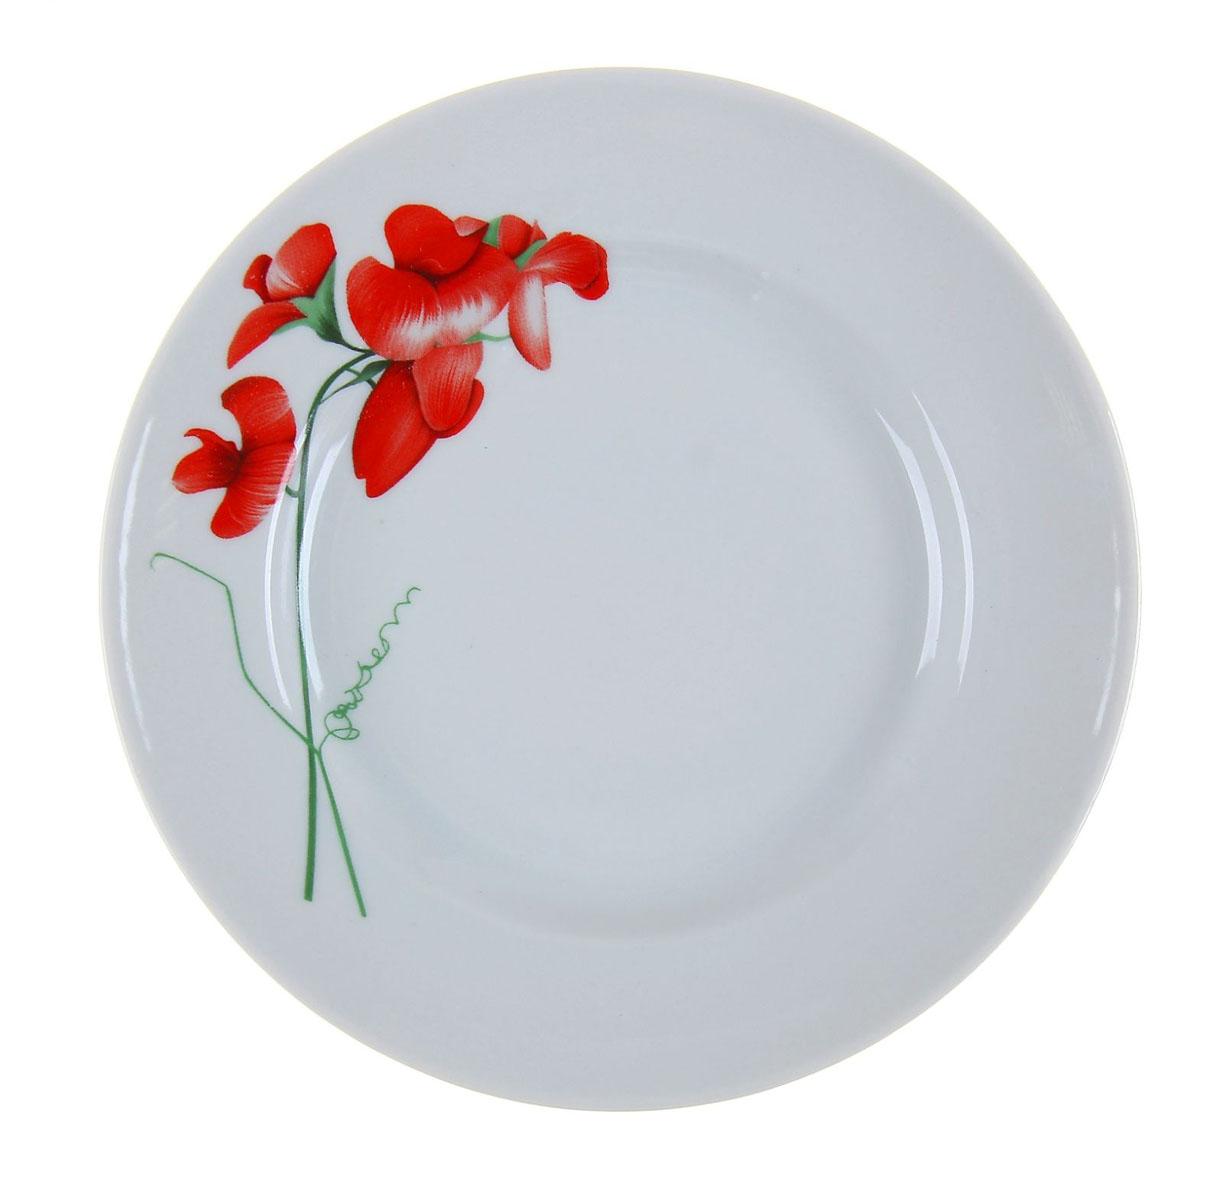 Тарелка мелкая Идиллия. Рубин, диаметр 20 см1109500